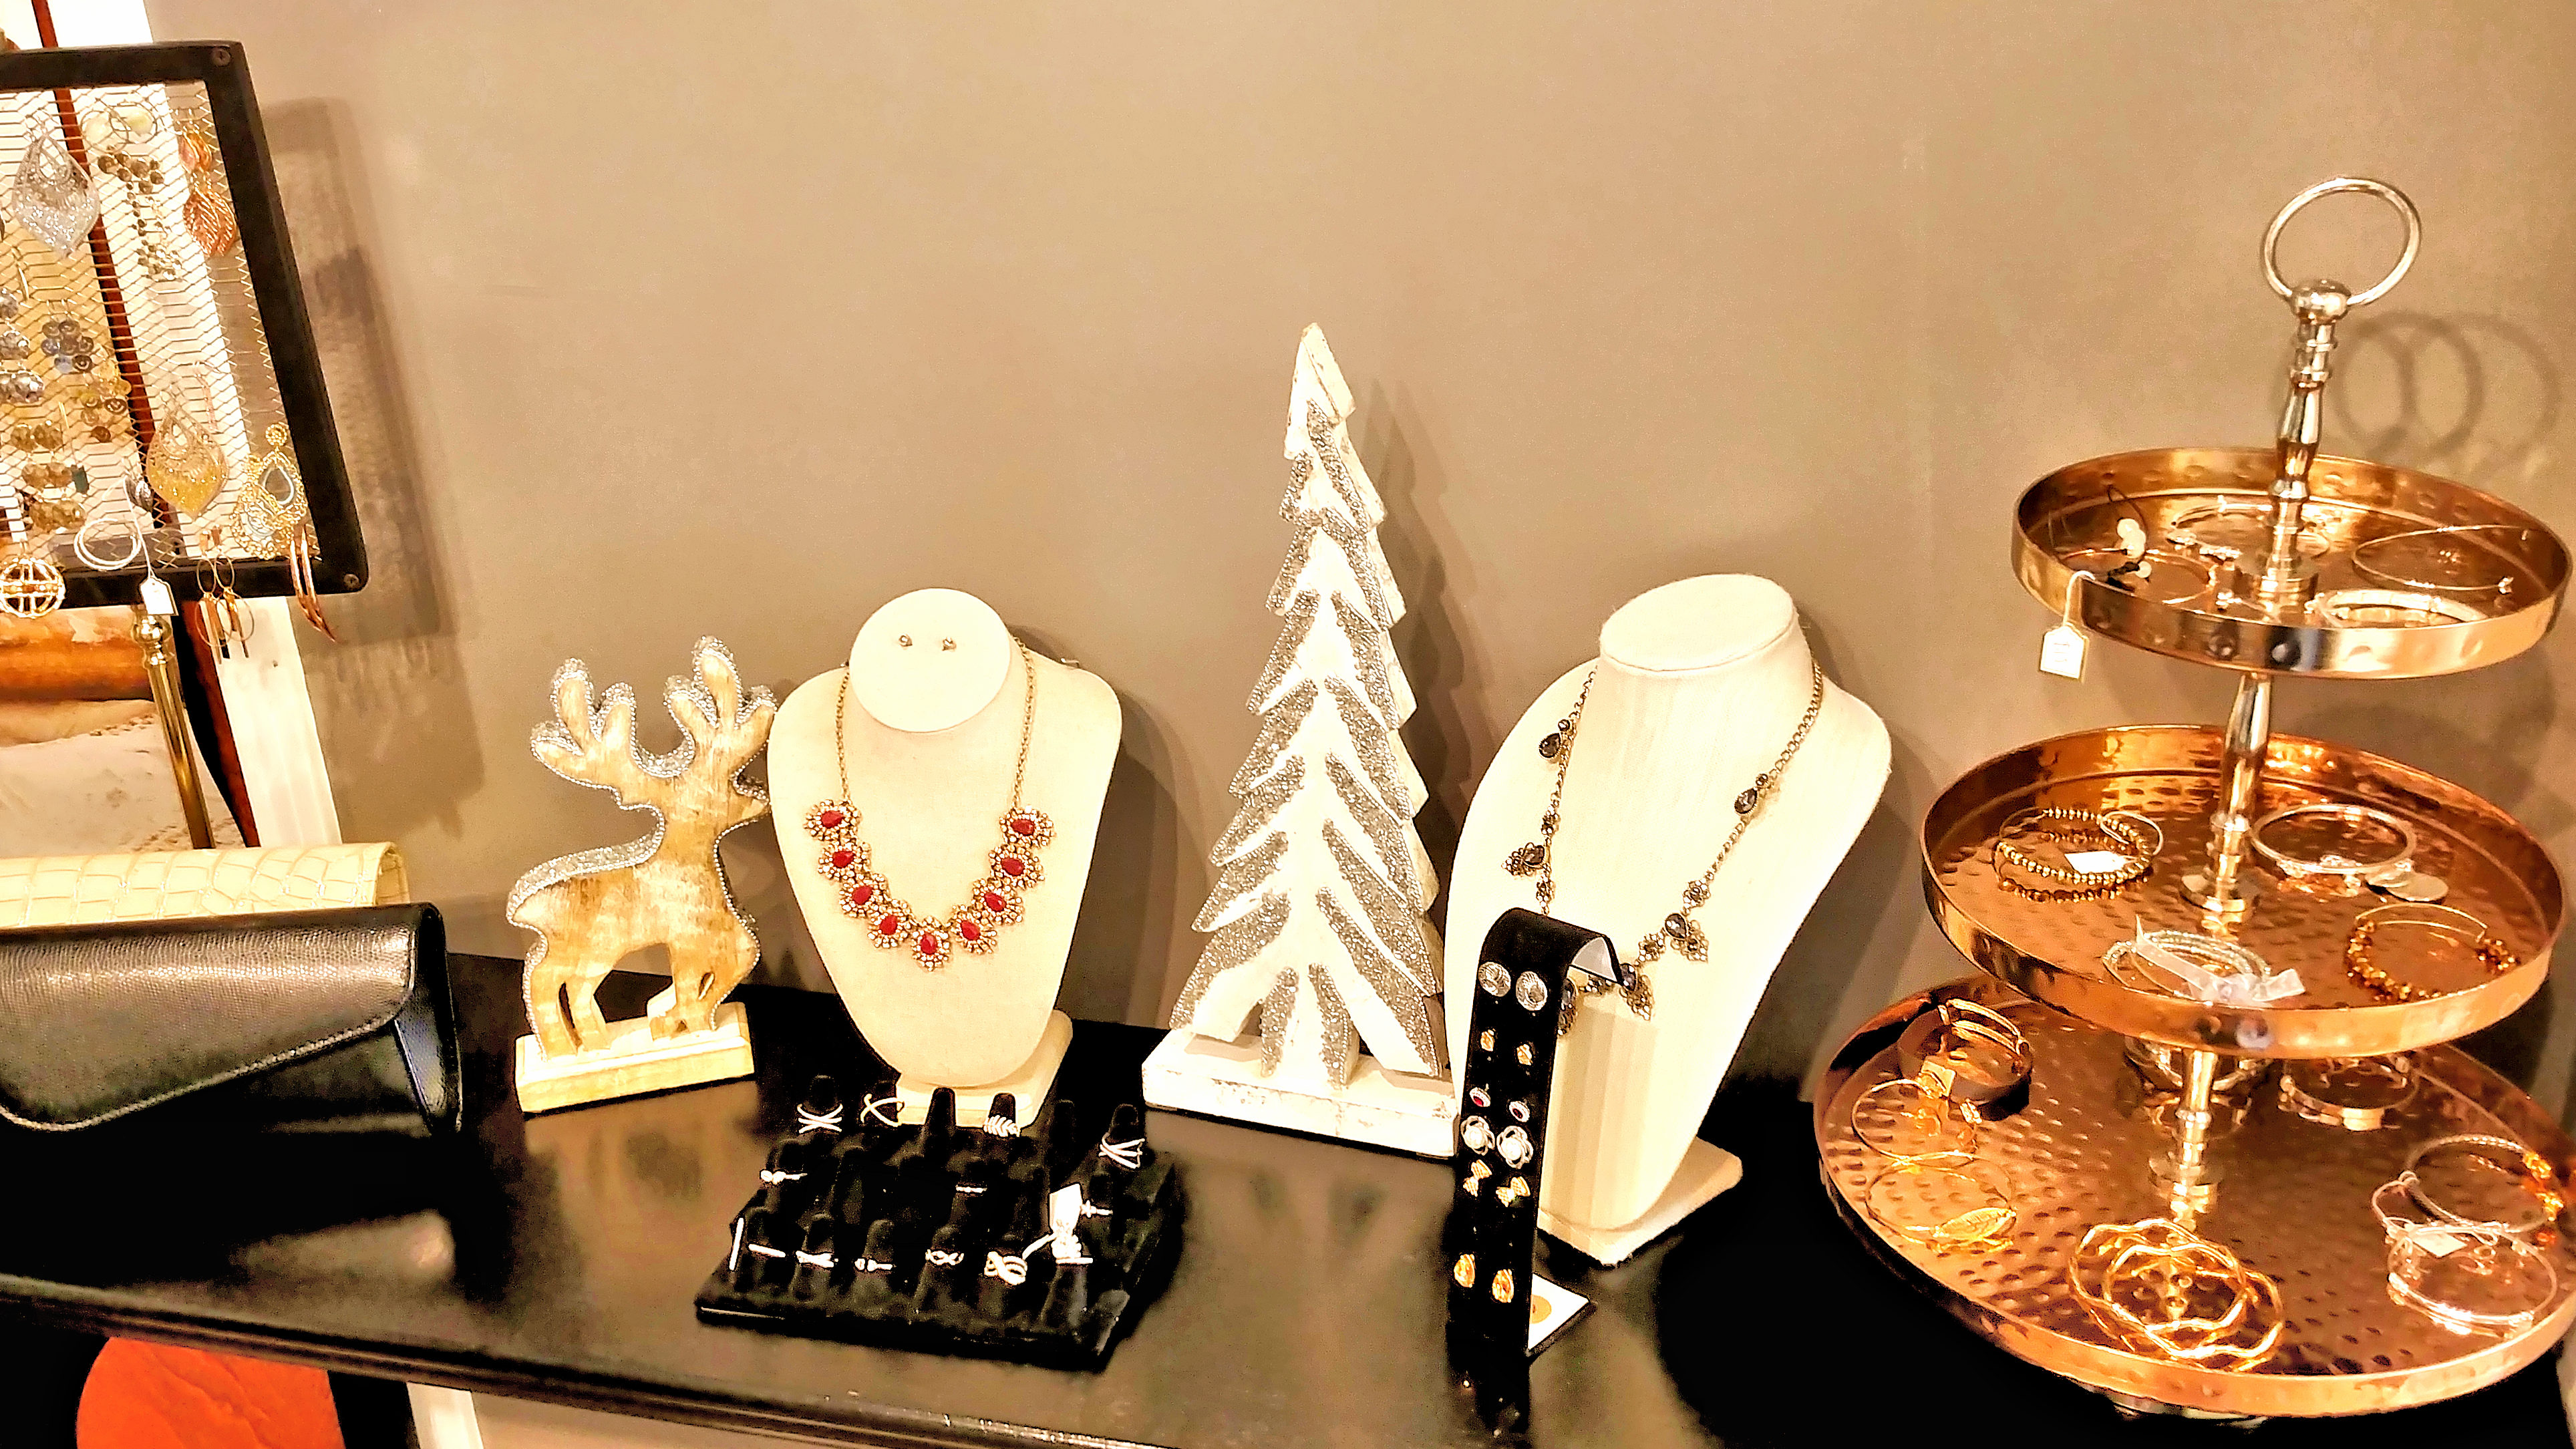 Finlia Salon - Holidays - Jewelry